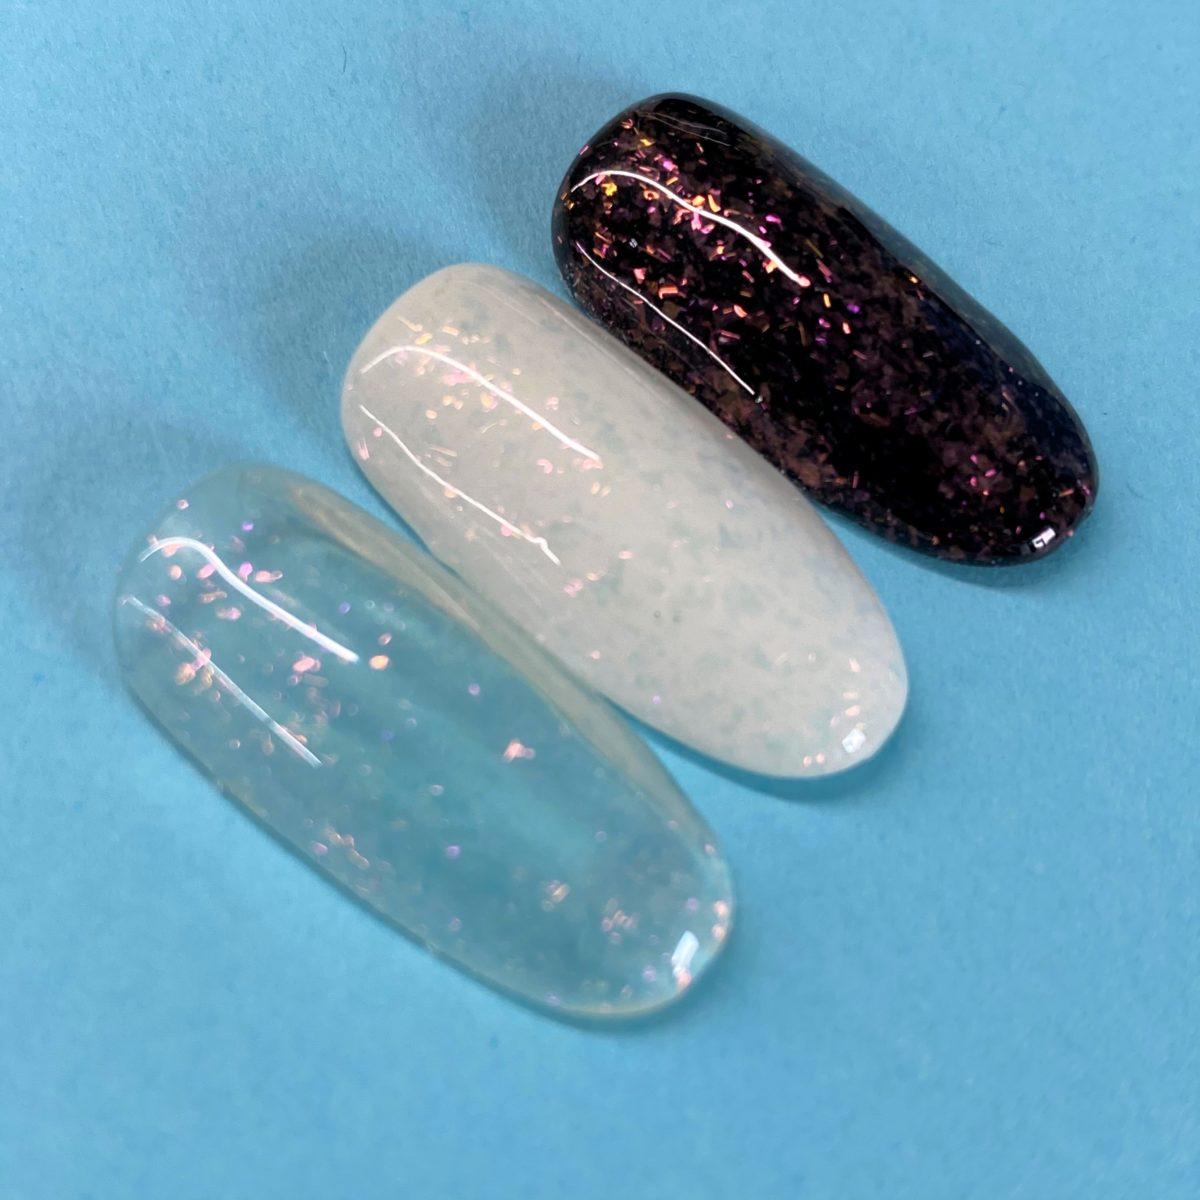 Melty Gel(メルティジェル) プレミアムカラージェル Crystal Pink(クリスタルピンク)